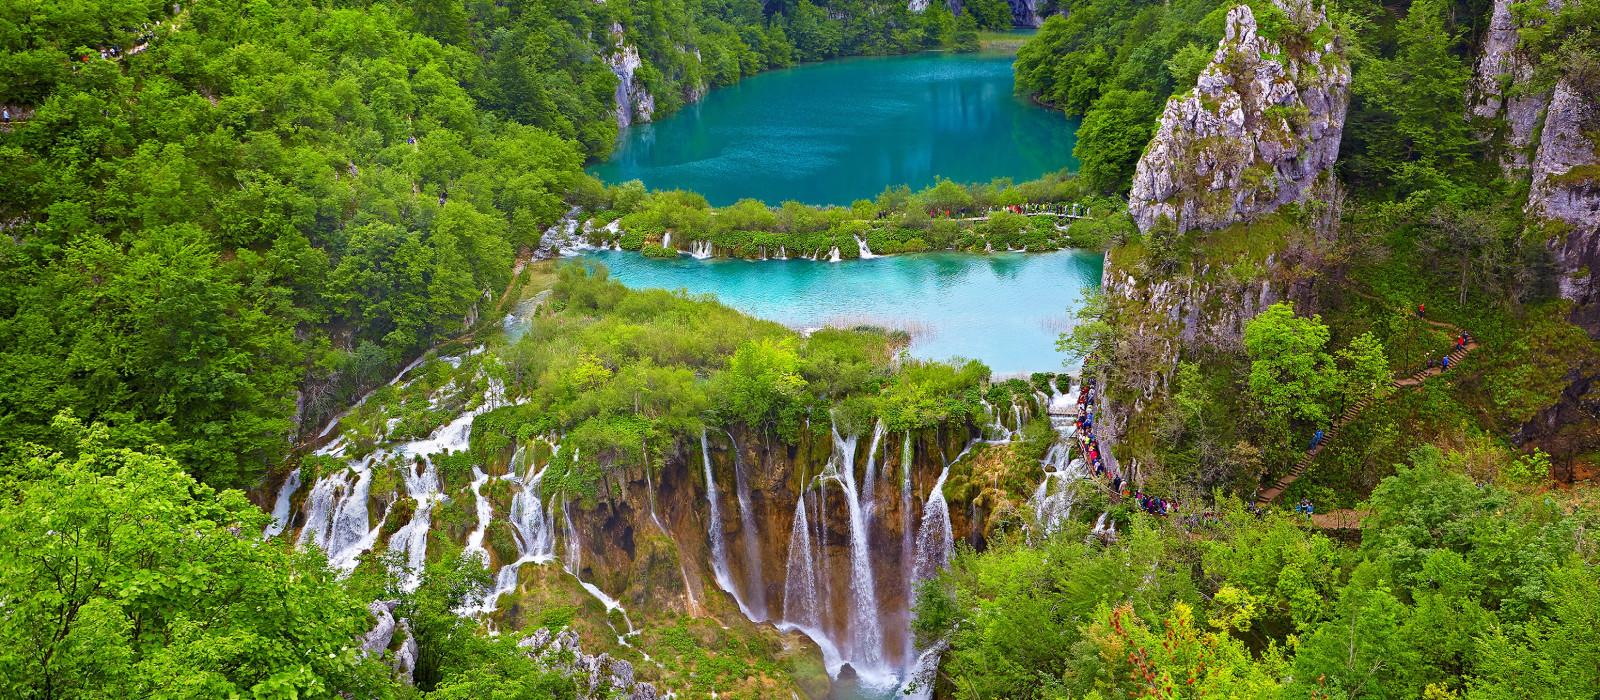 Kroatien Roadtrip – Klassiker aus neuen Perspektiven Urlaub 1